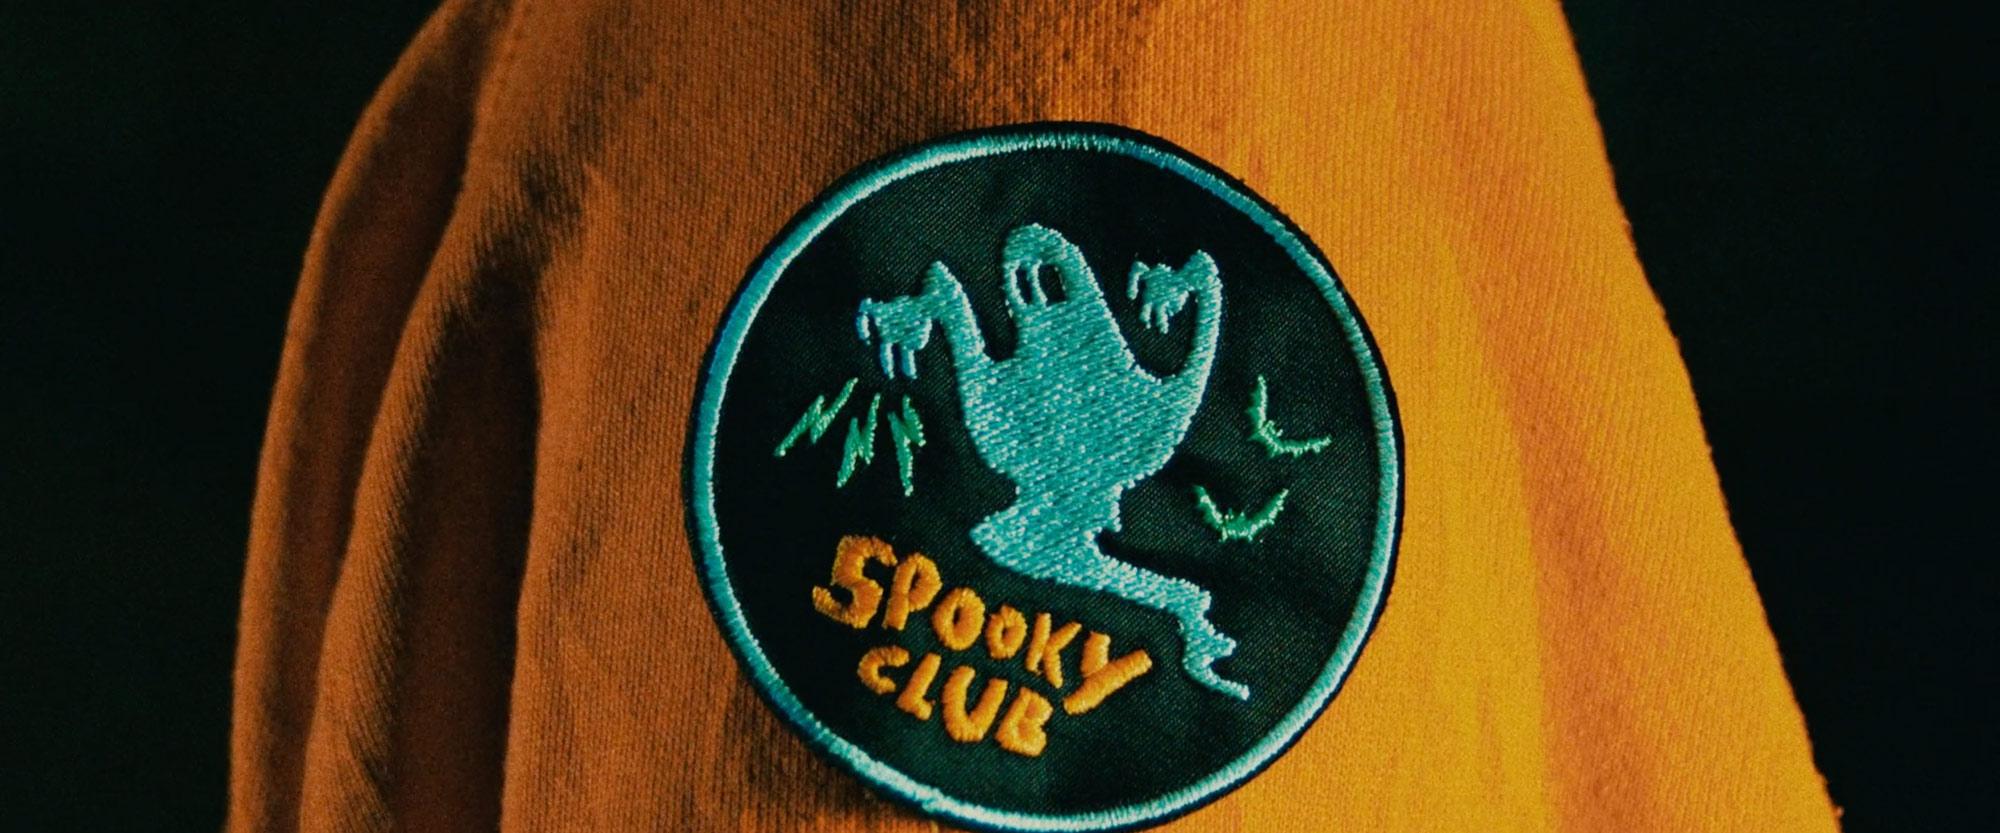 spooky_club02